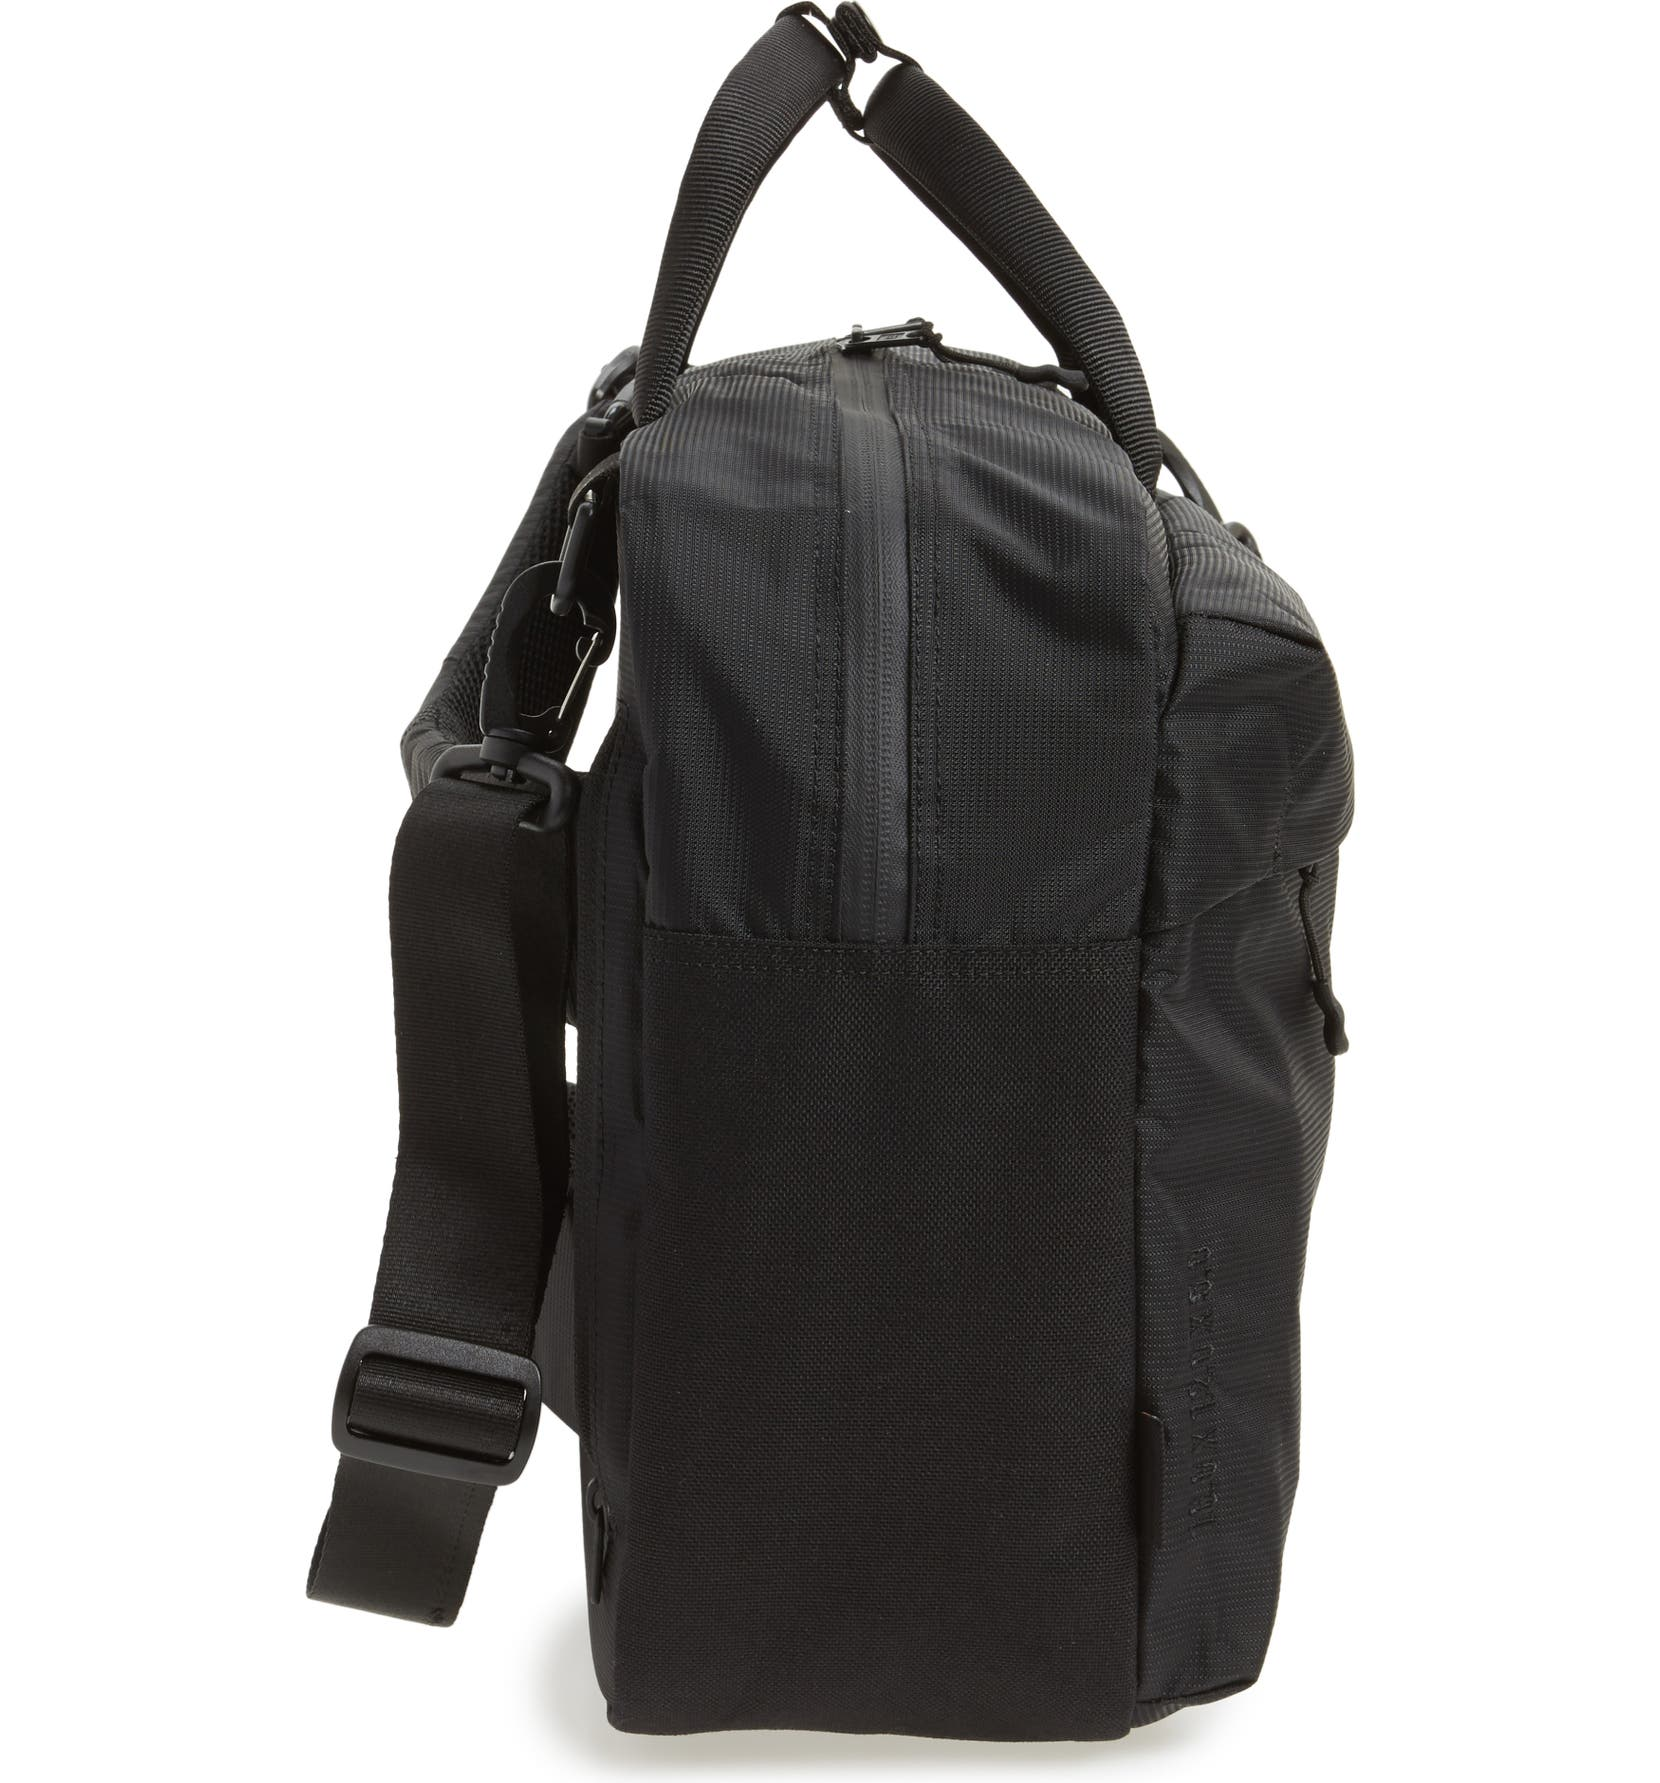 9ffb58ceeae Herschel Supply Co. Britannia Convertible Messenger Bag